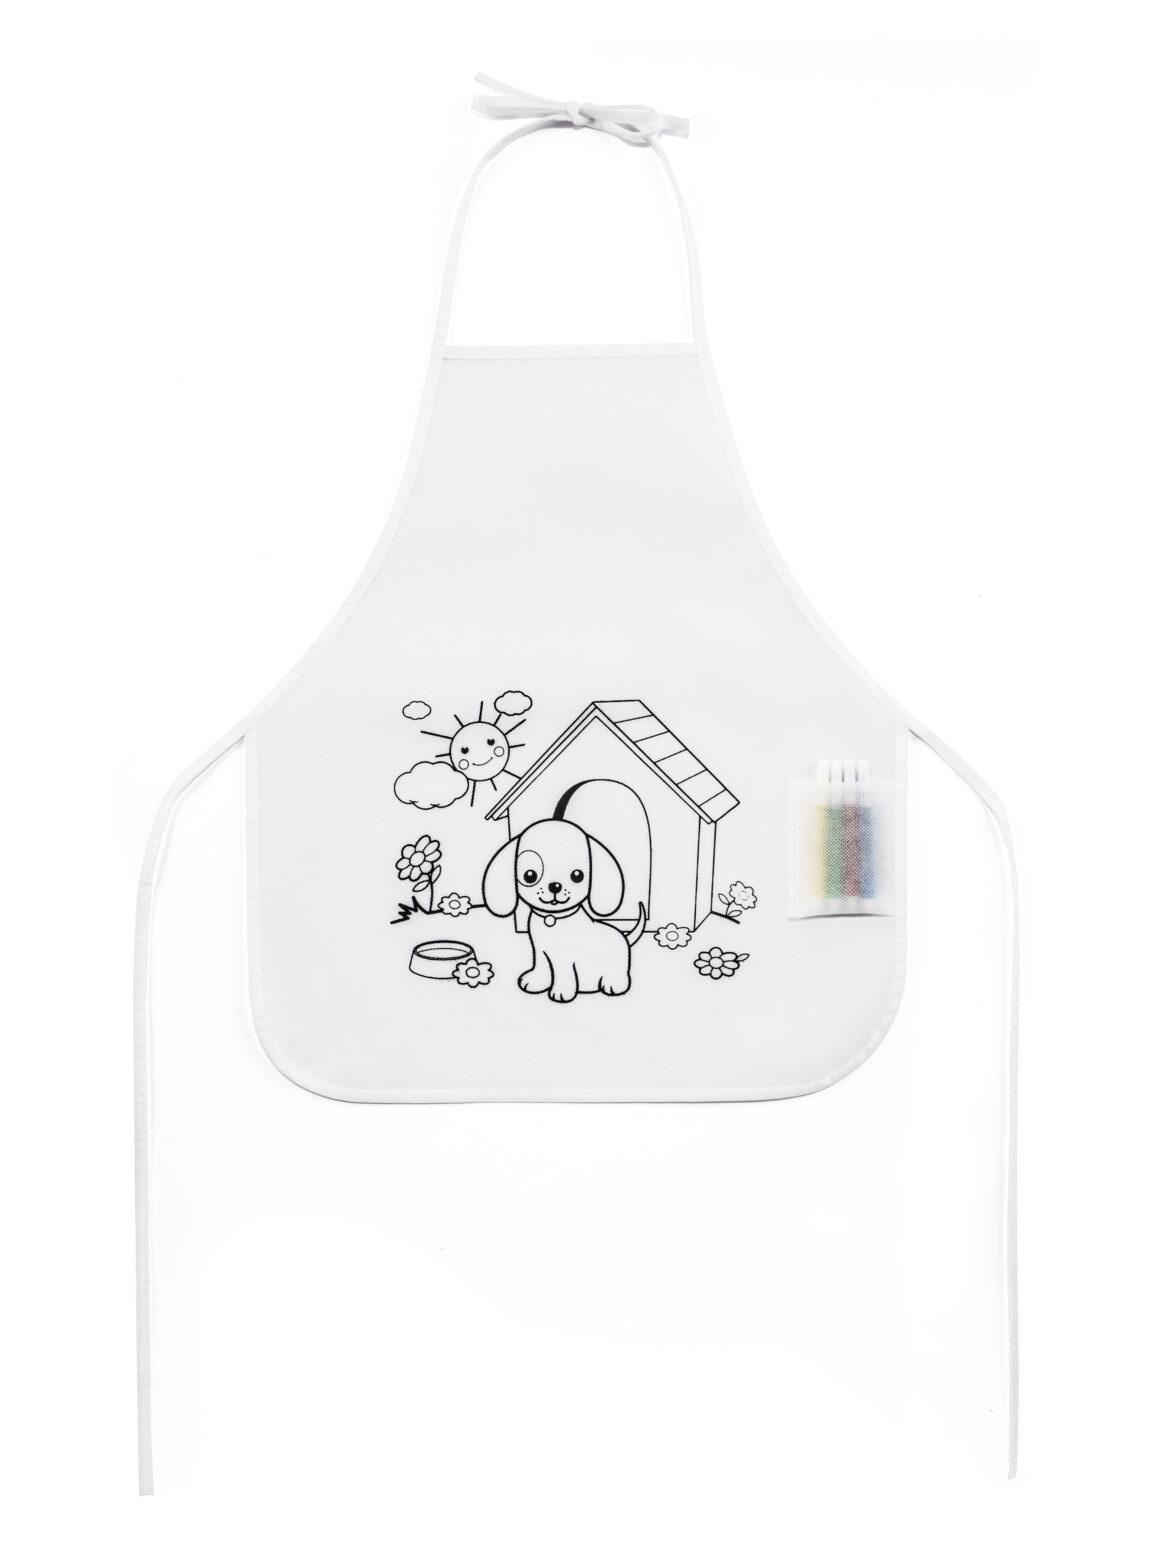 Penzance Children's colouring apron Product Code GP99834